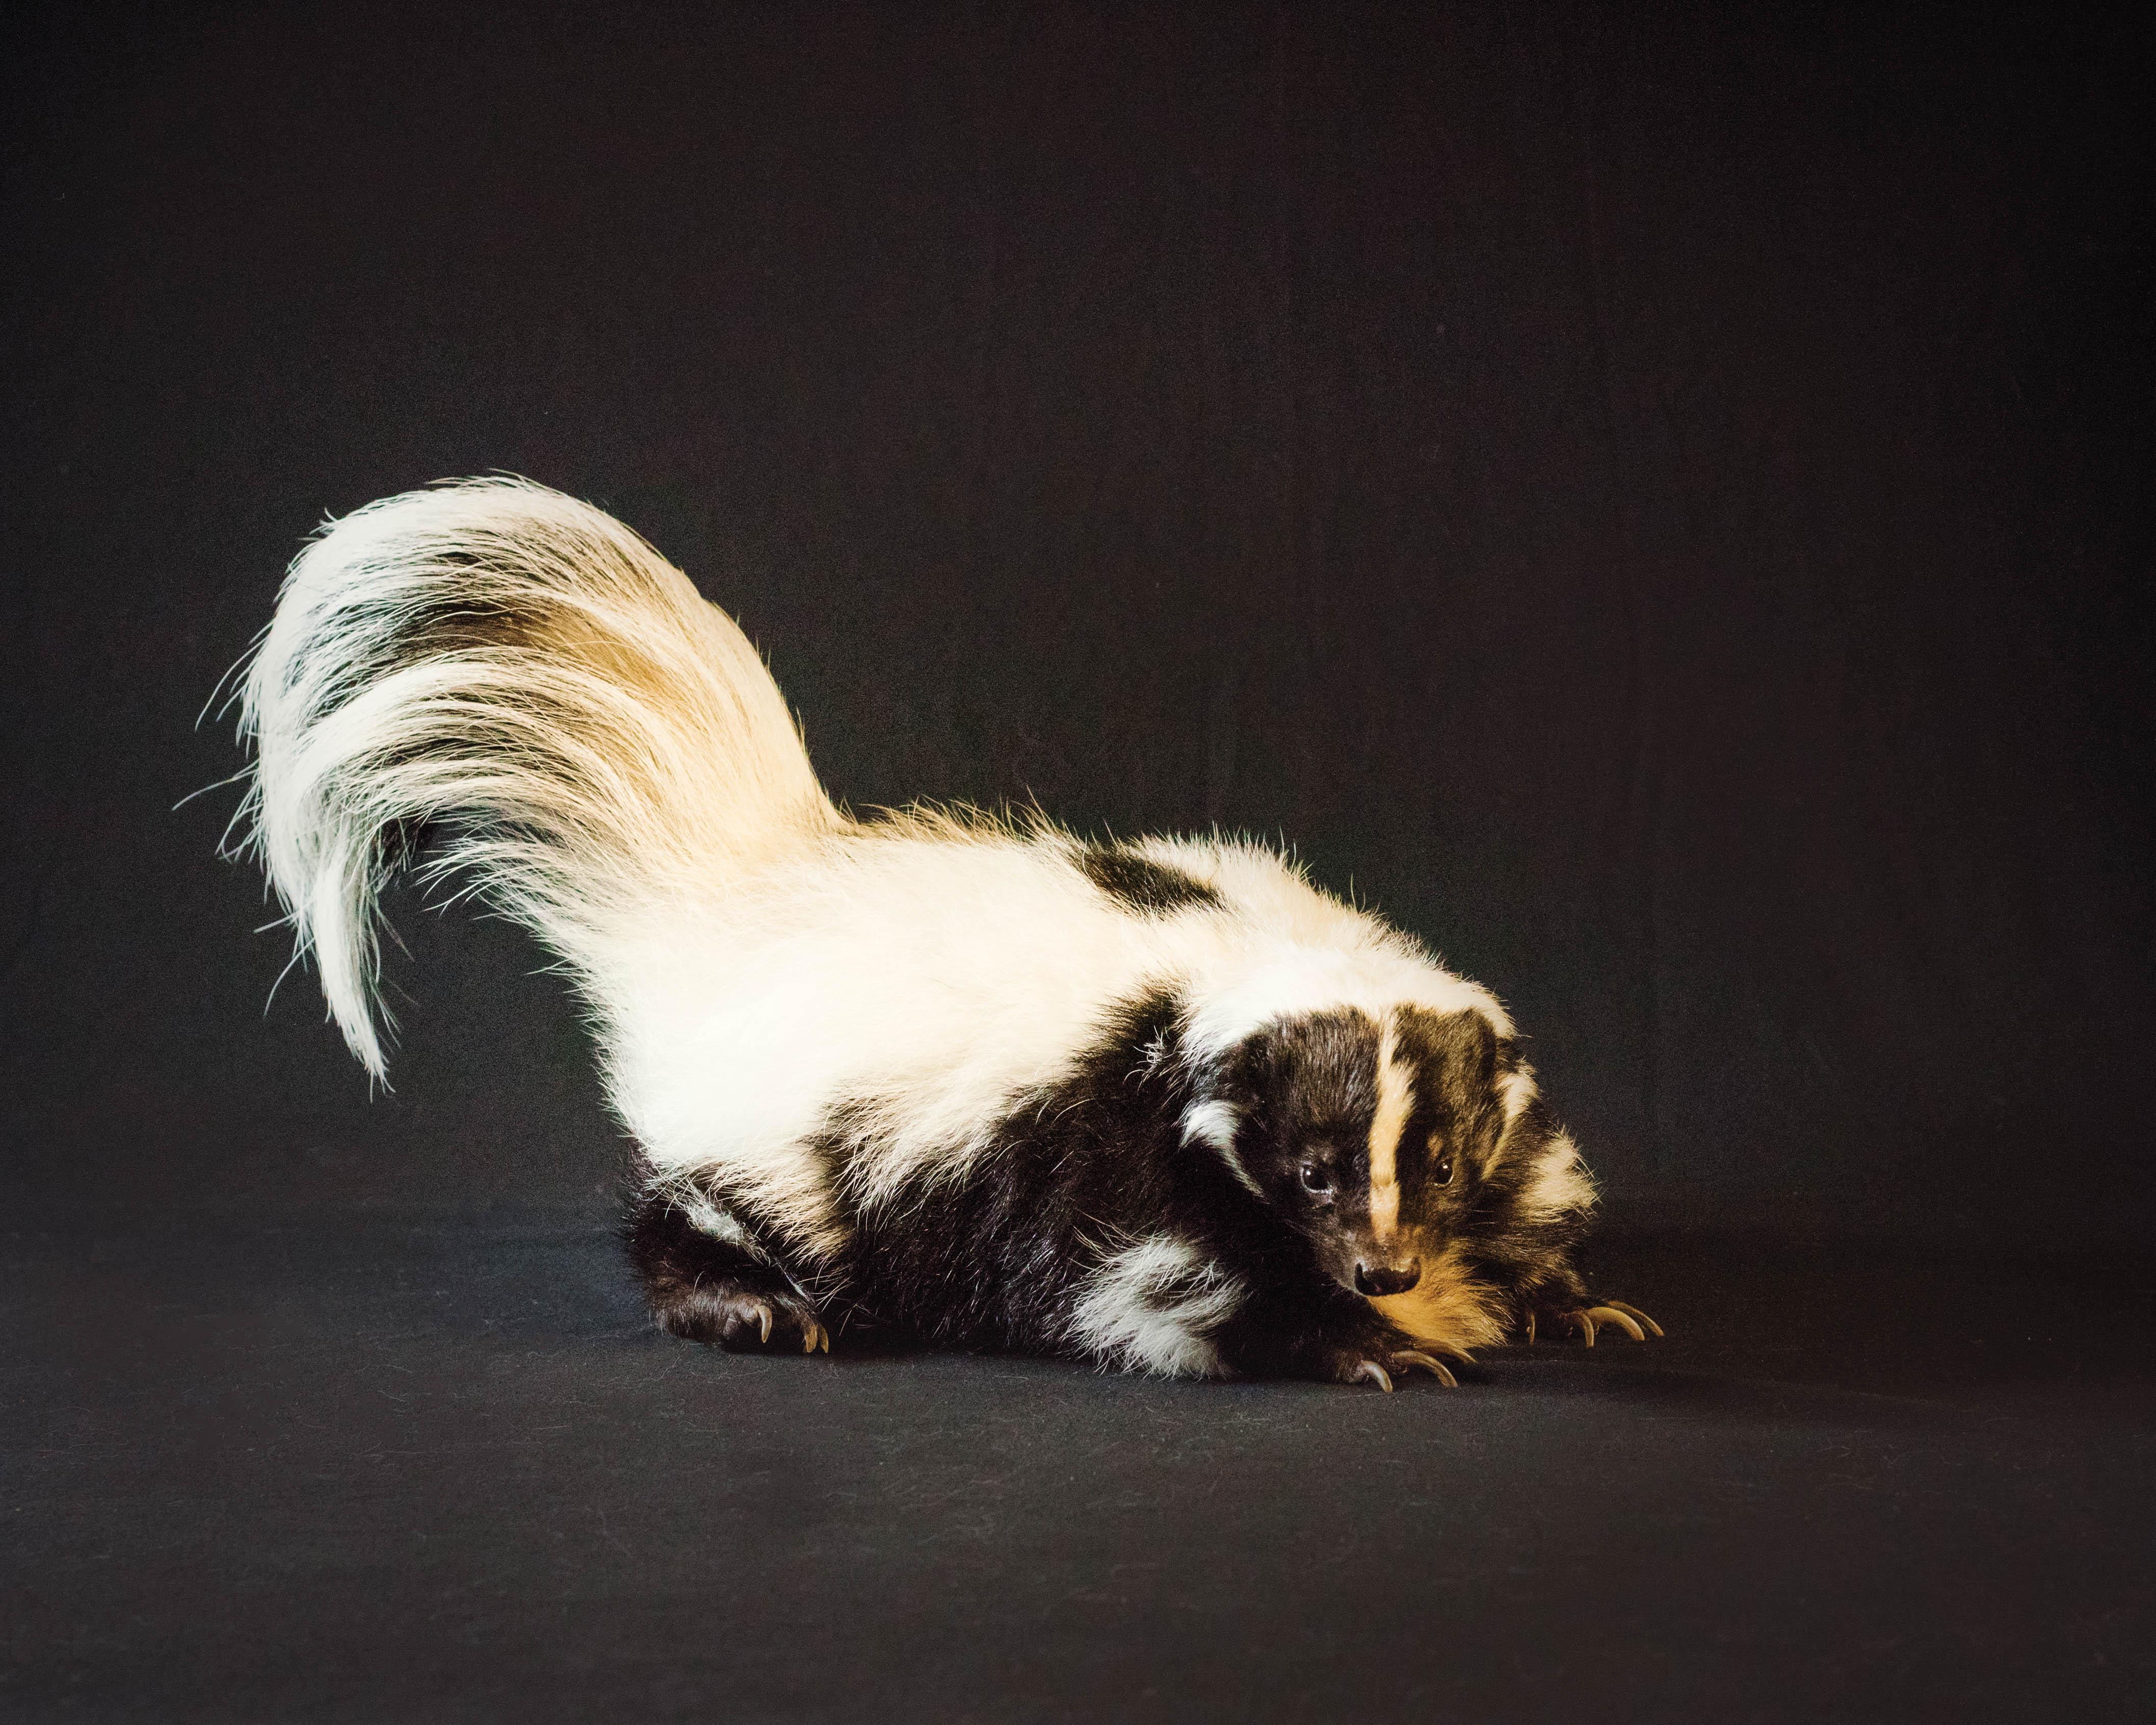 Pet_Photographer_Colchester_skunk